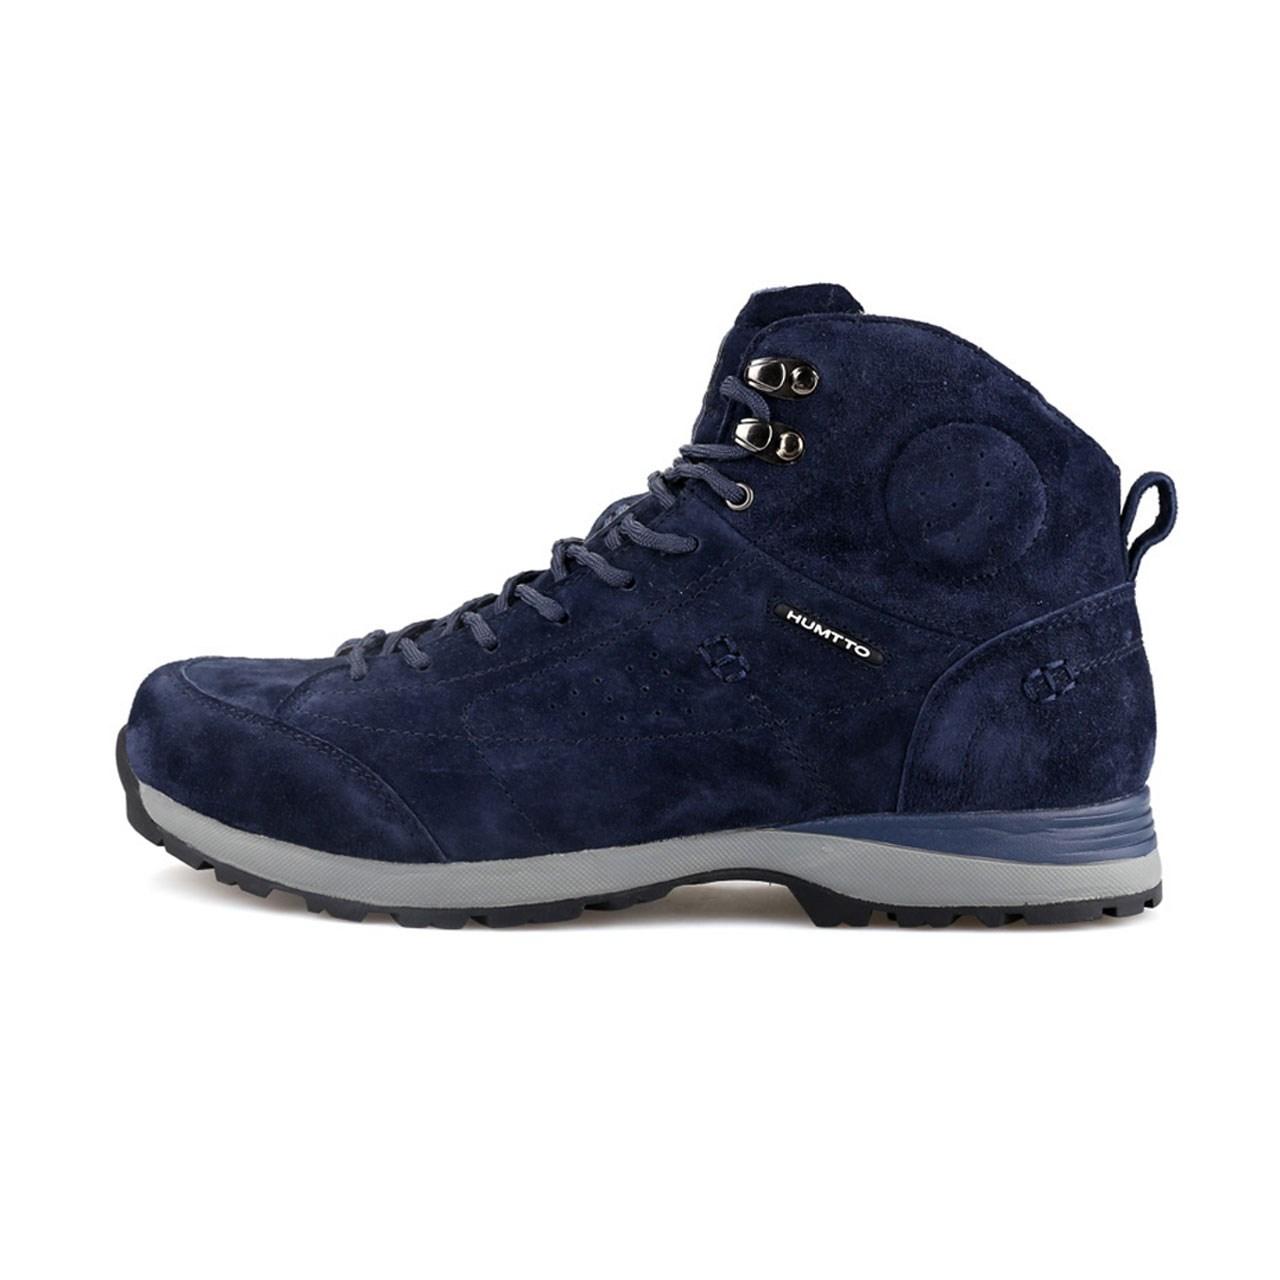 قیمت کفش کوهنوردی مردانه هامتو مدل 1-753615